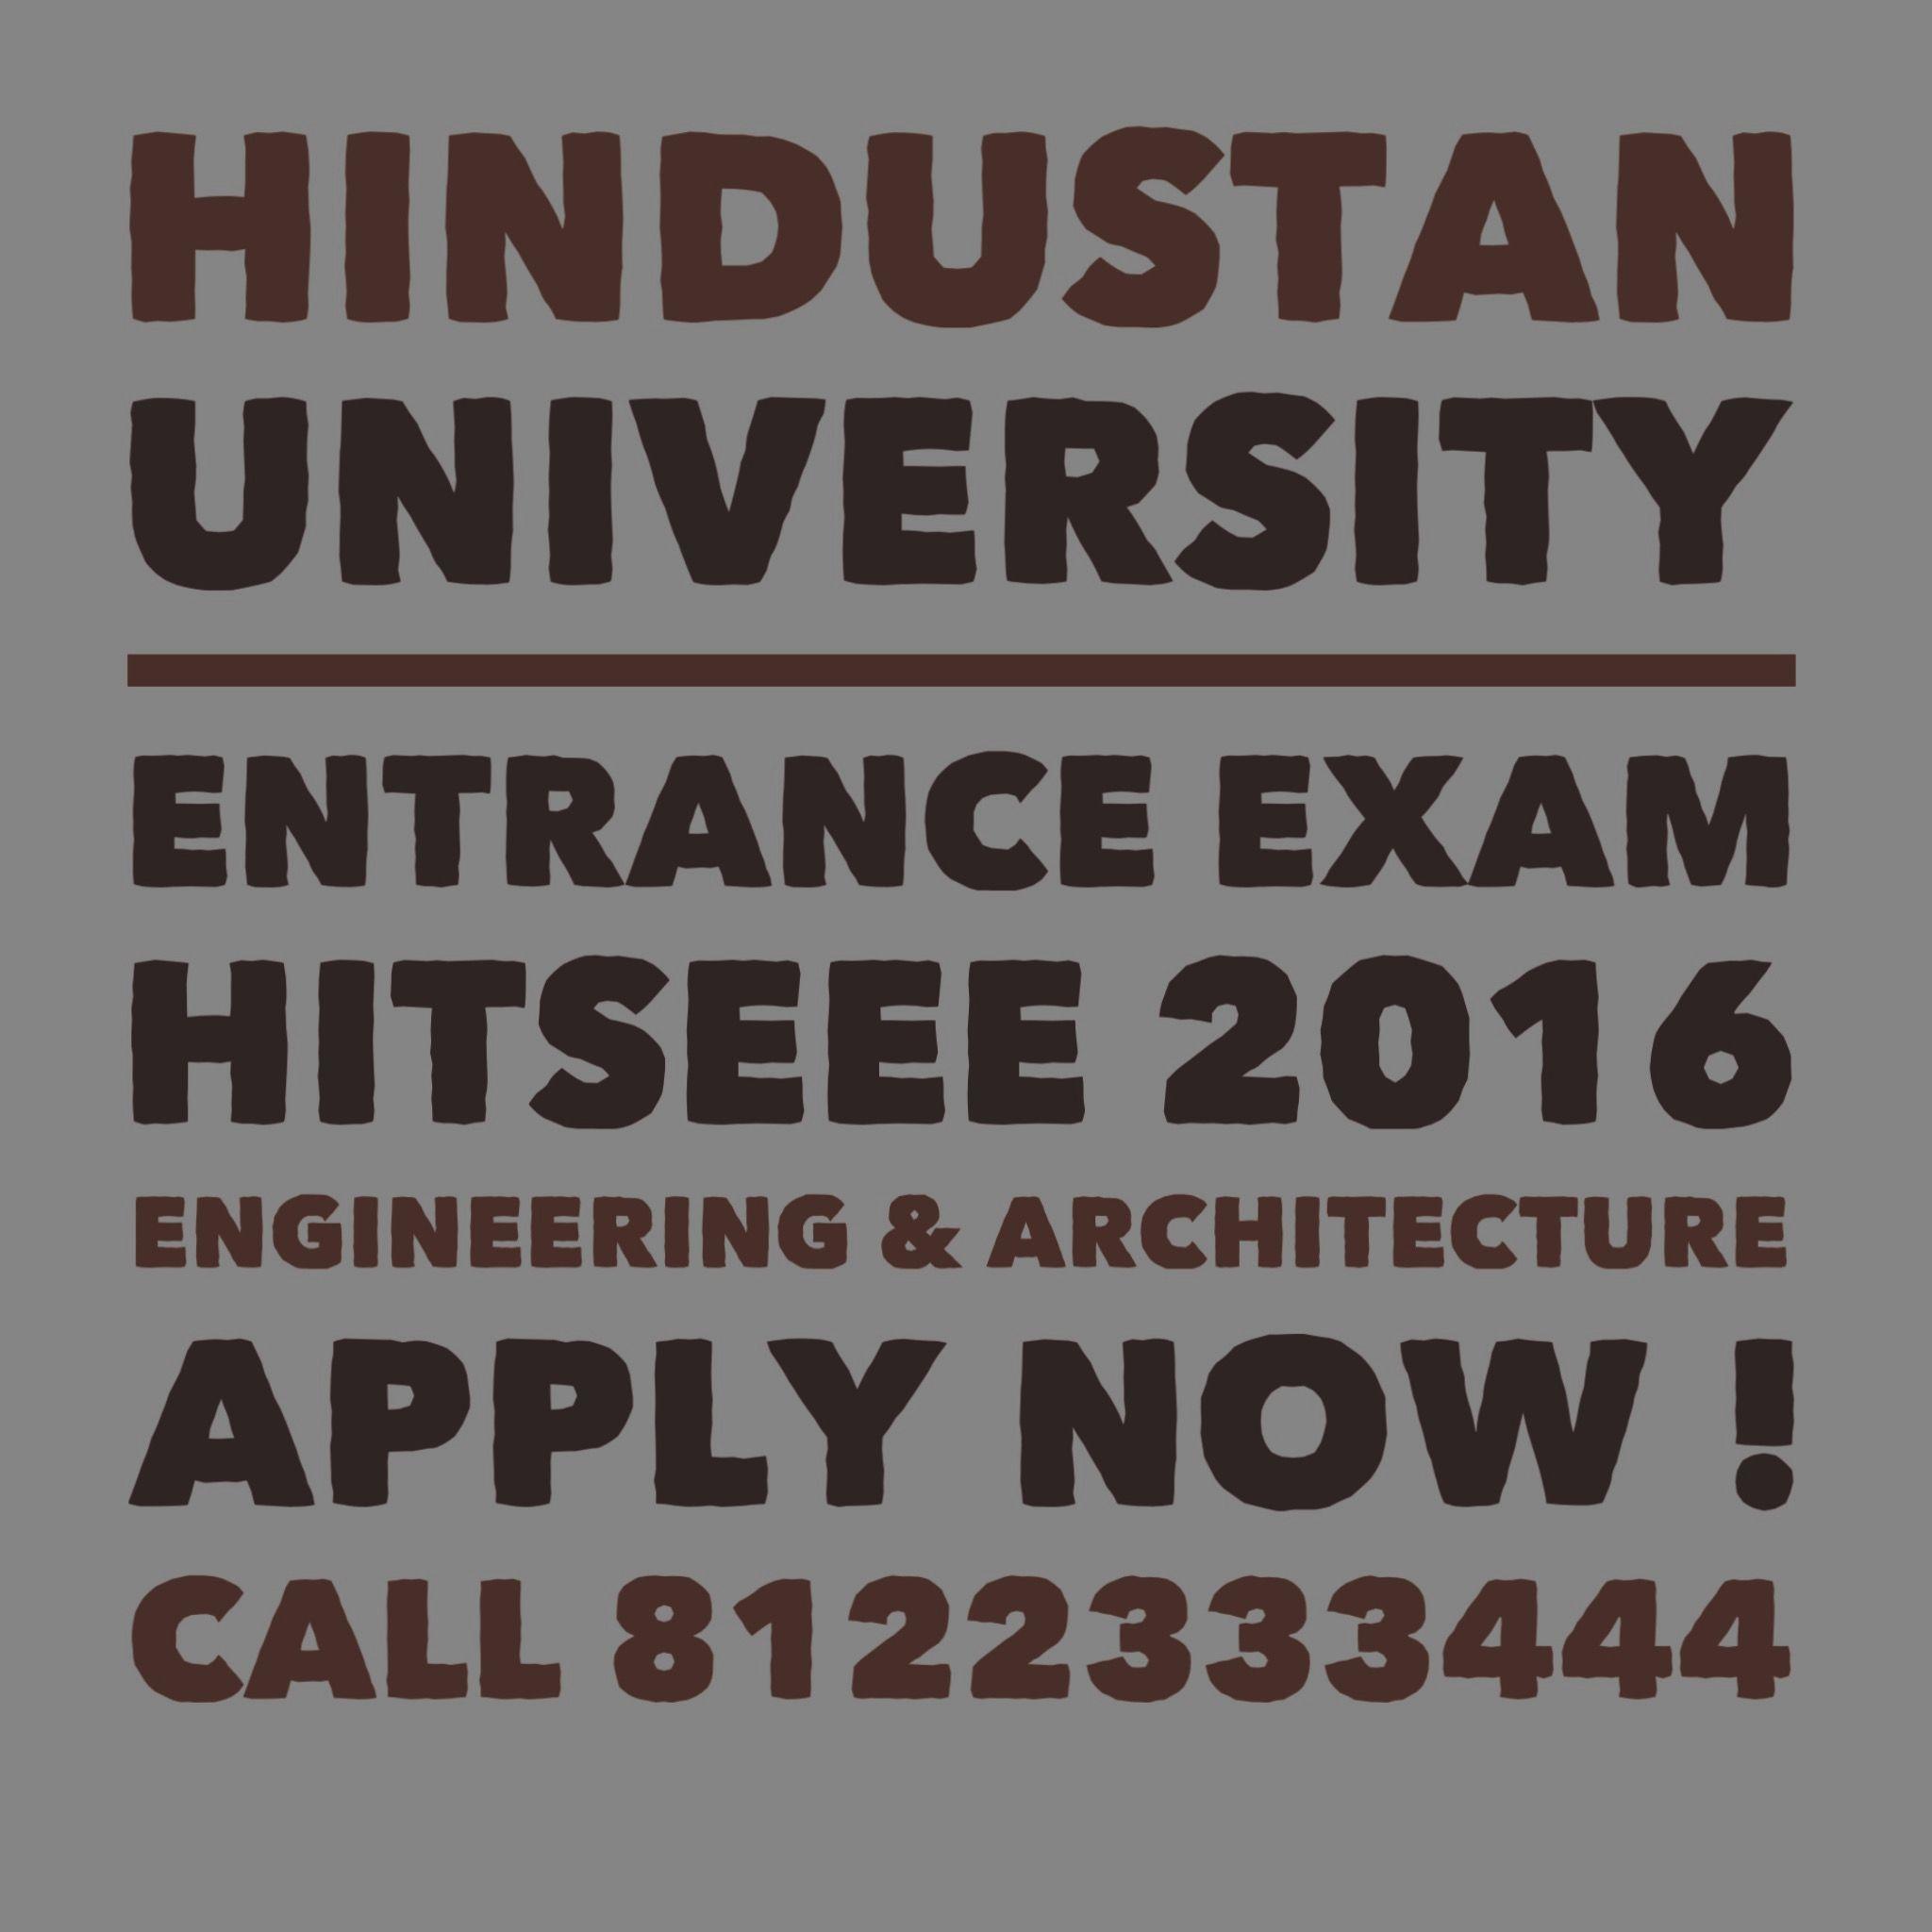 HITSEEE 2016 Hindustan University Engineering Entrance